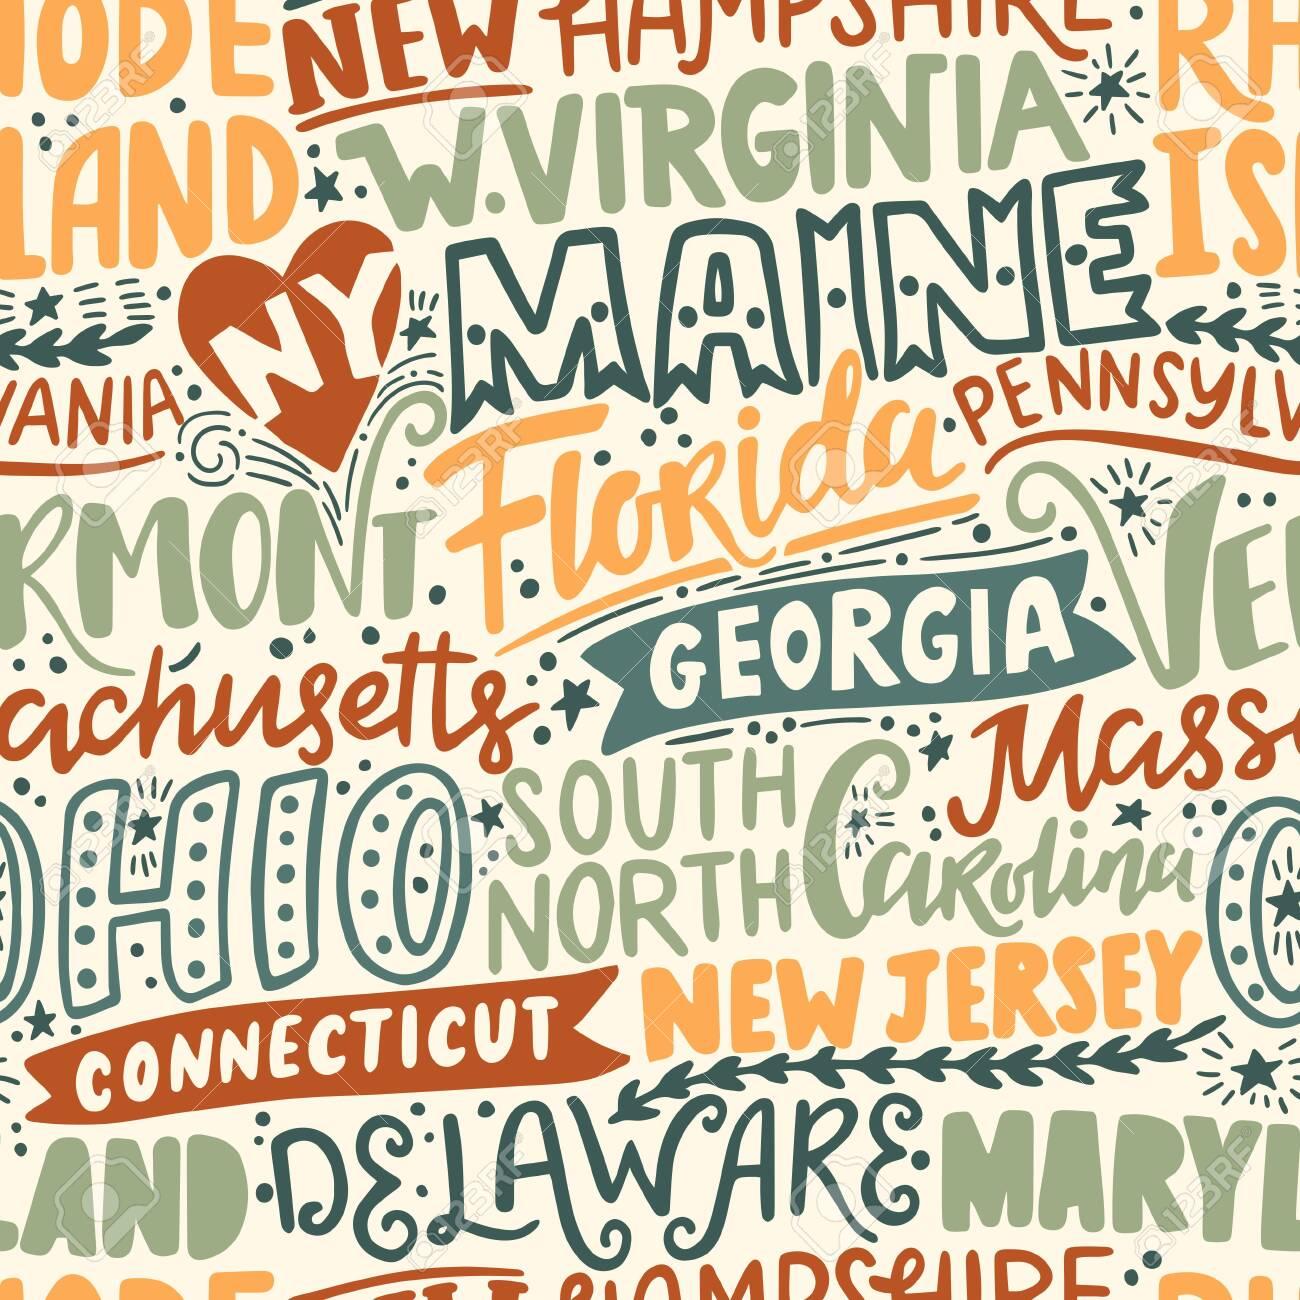 Vector seamless pattern with USA states. New York, Maine, Florida, Georgia, Vermont, Massachusetts, Ohio, Carolina, New Jersey, Connecticut, Maryland, Delaware, Virginia, Rhode Island, Pennsylvania - 149823748